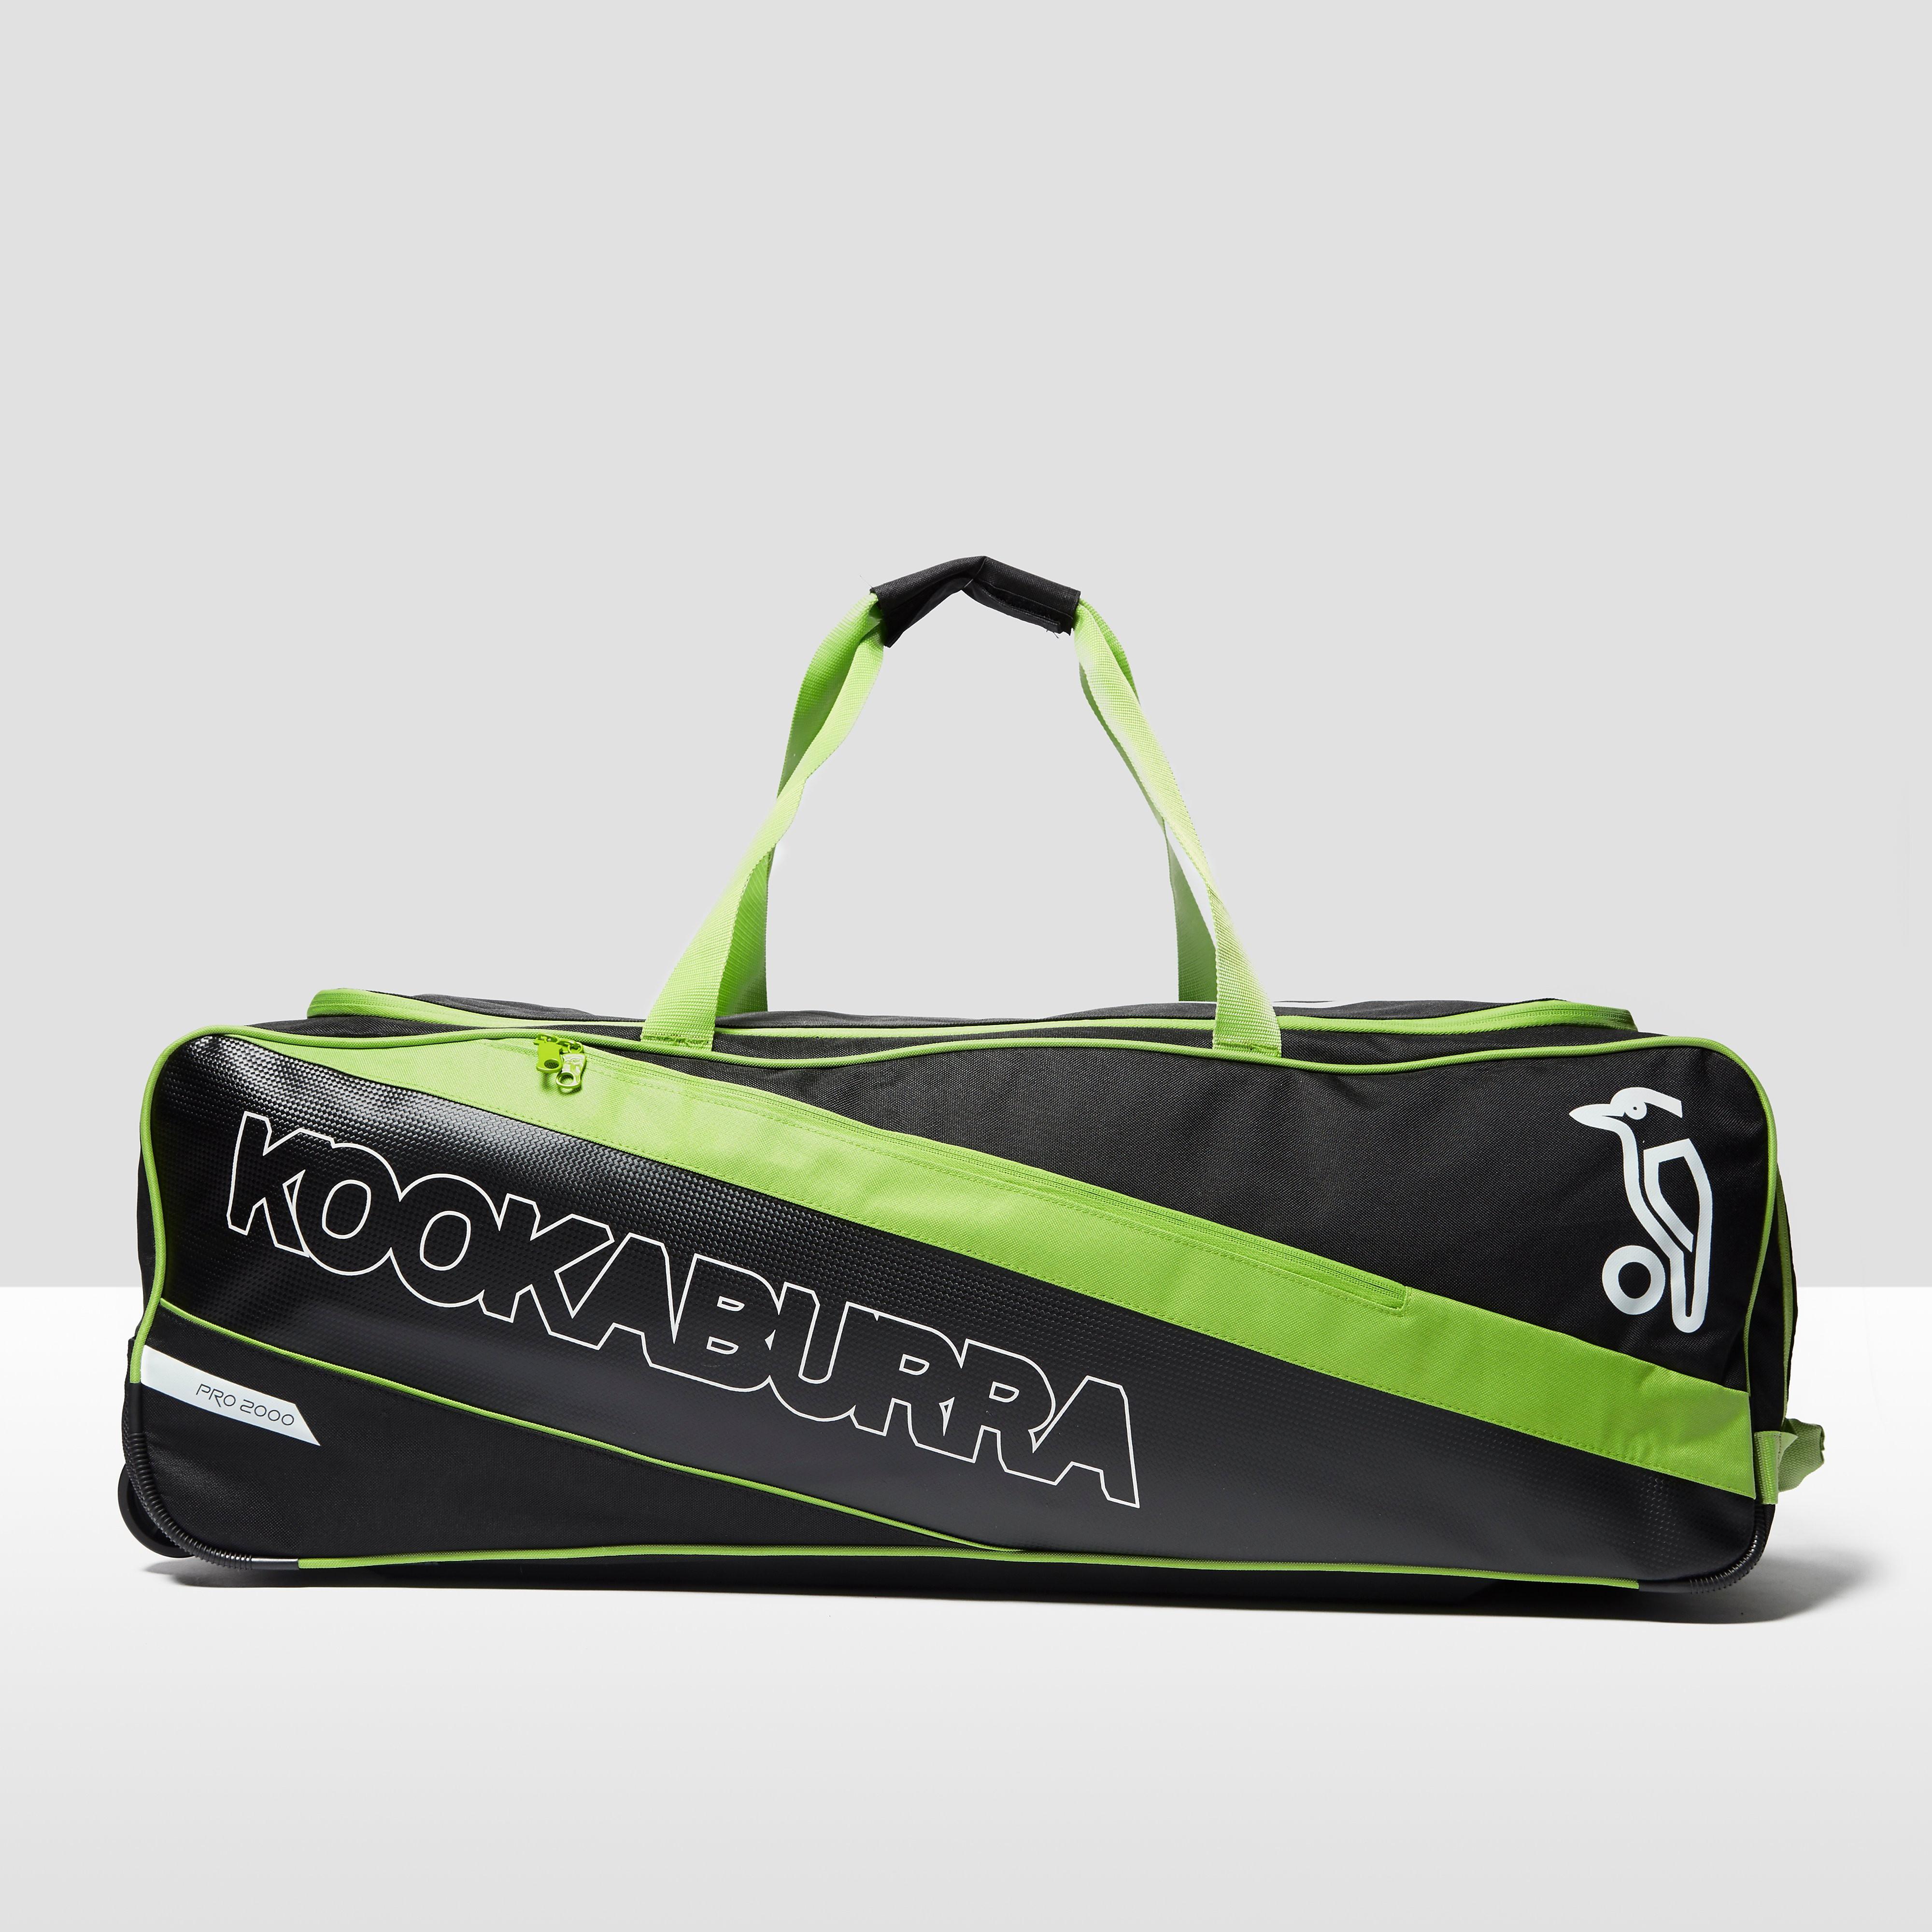 Kookaburra Pro 2000 Wheelie Cricket Kit Bag